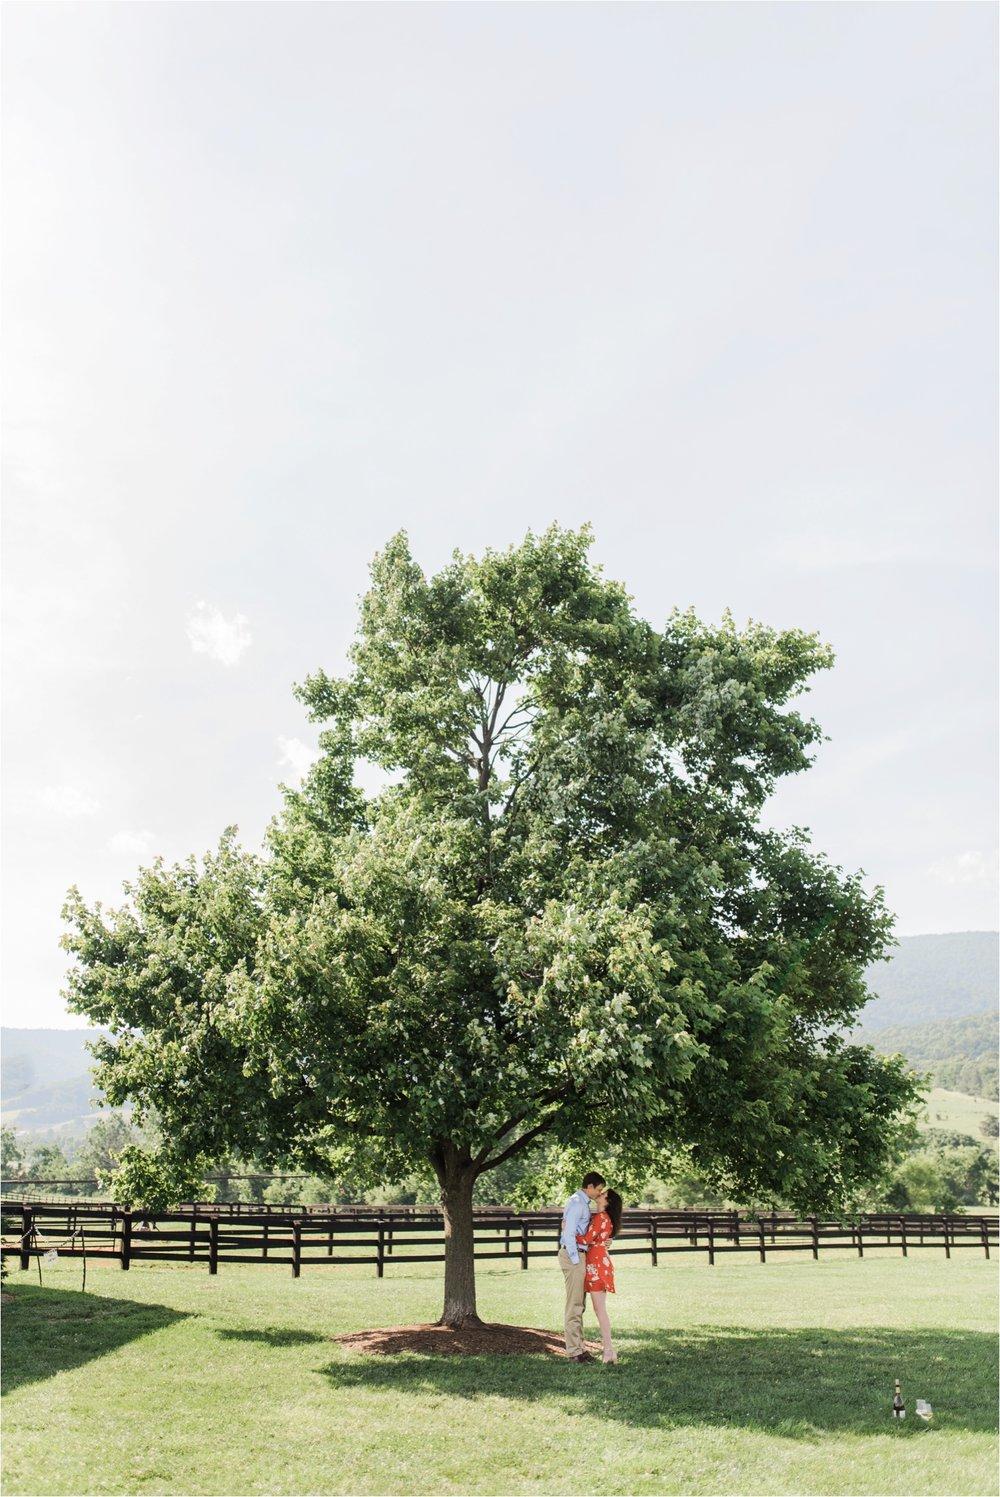 inrichmond-virginia-wedding-photographer-king-family-winery-engagement-photo_0007.jpg